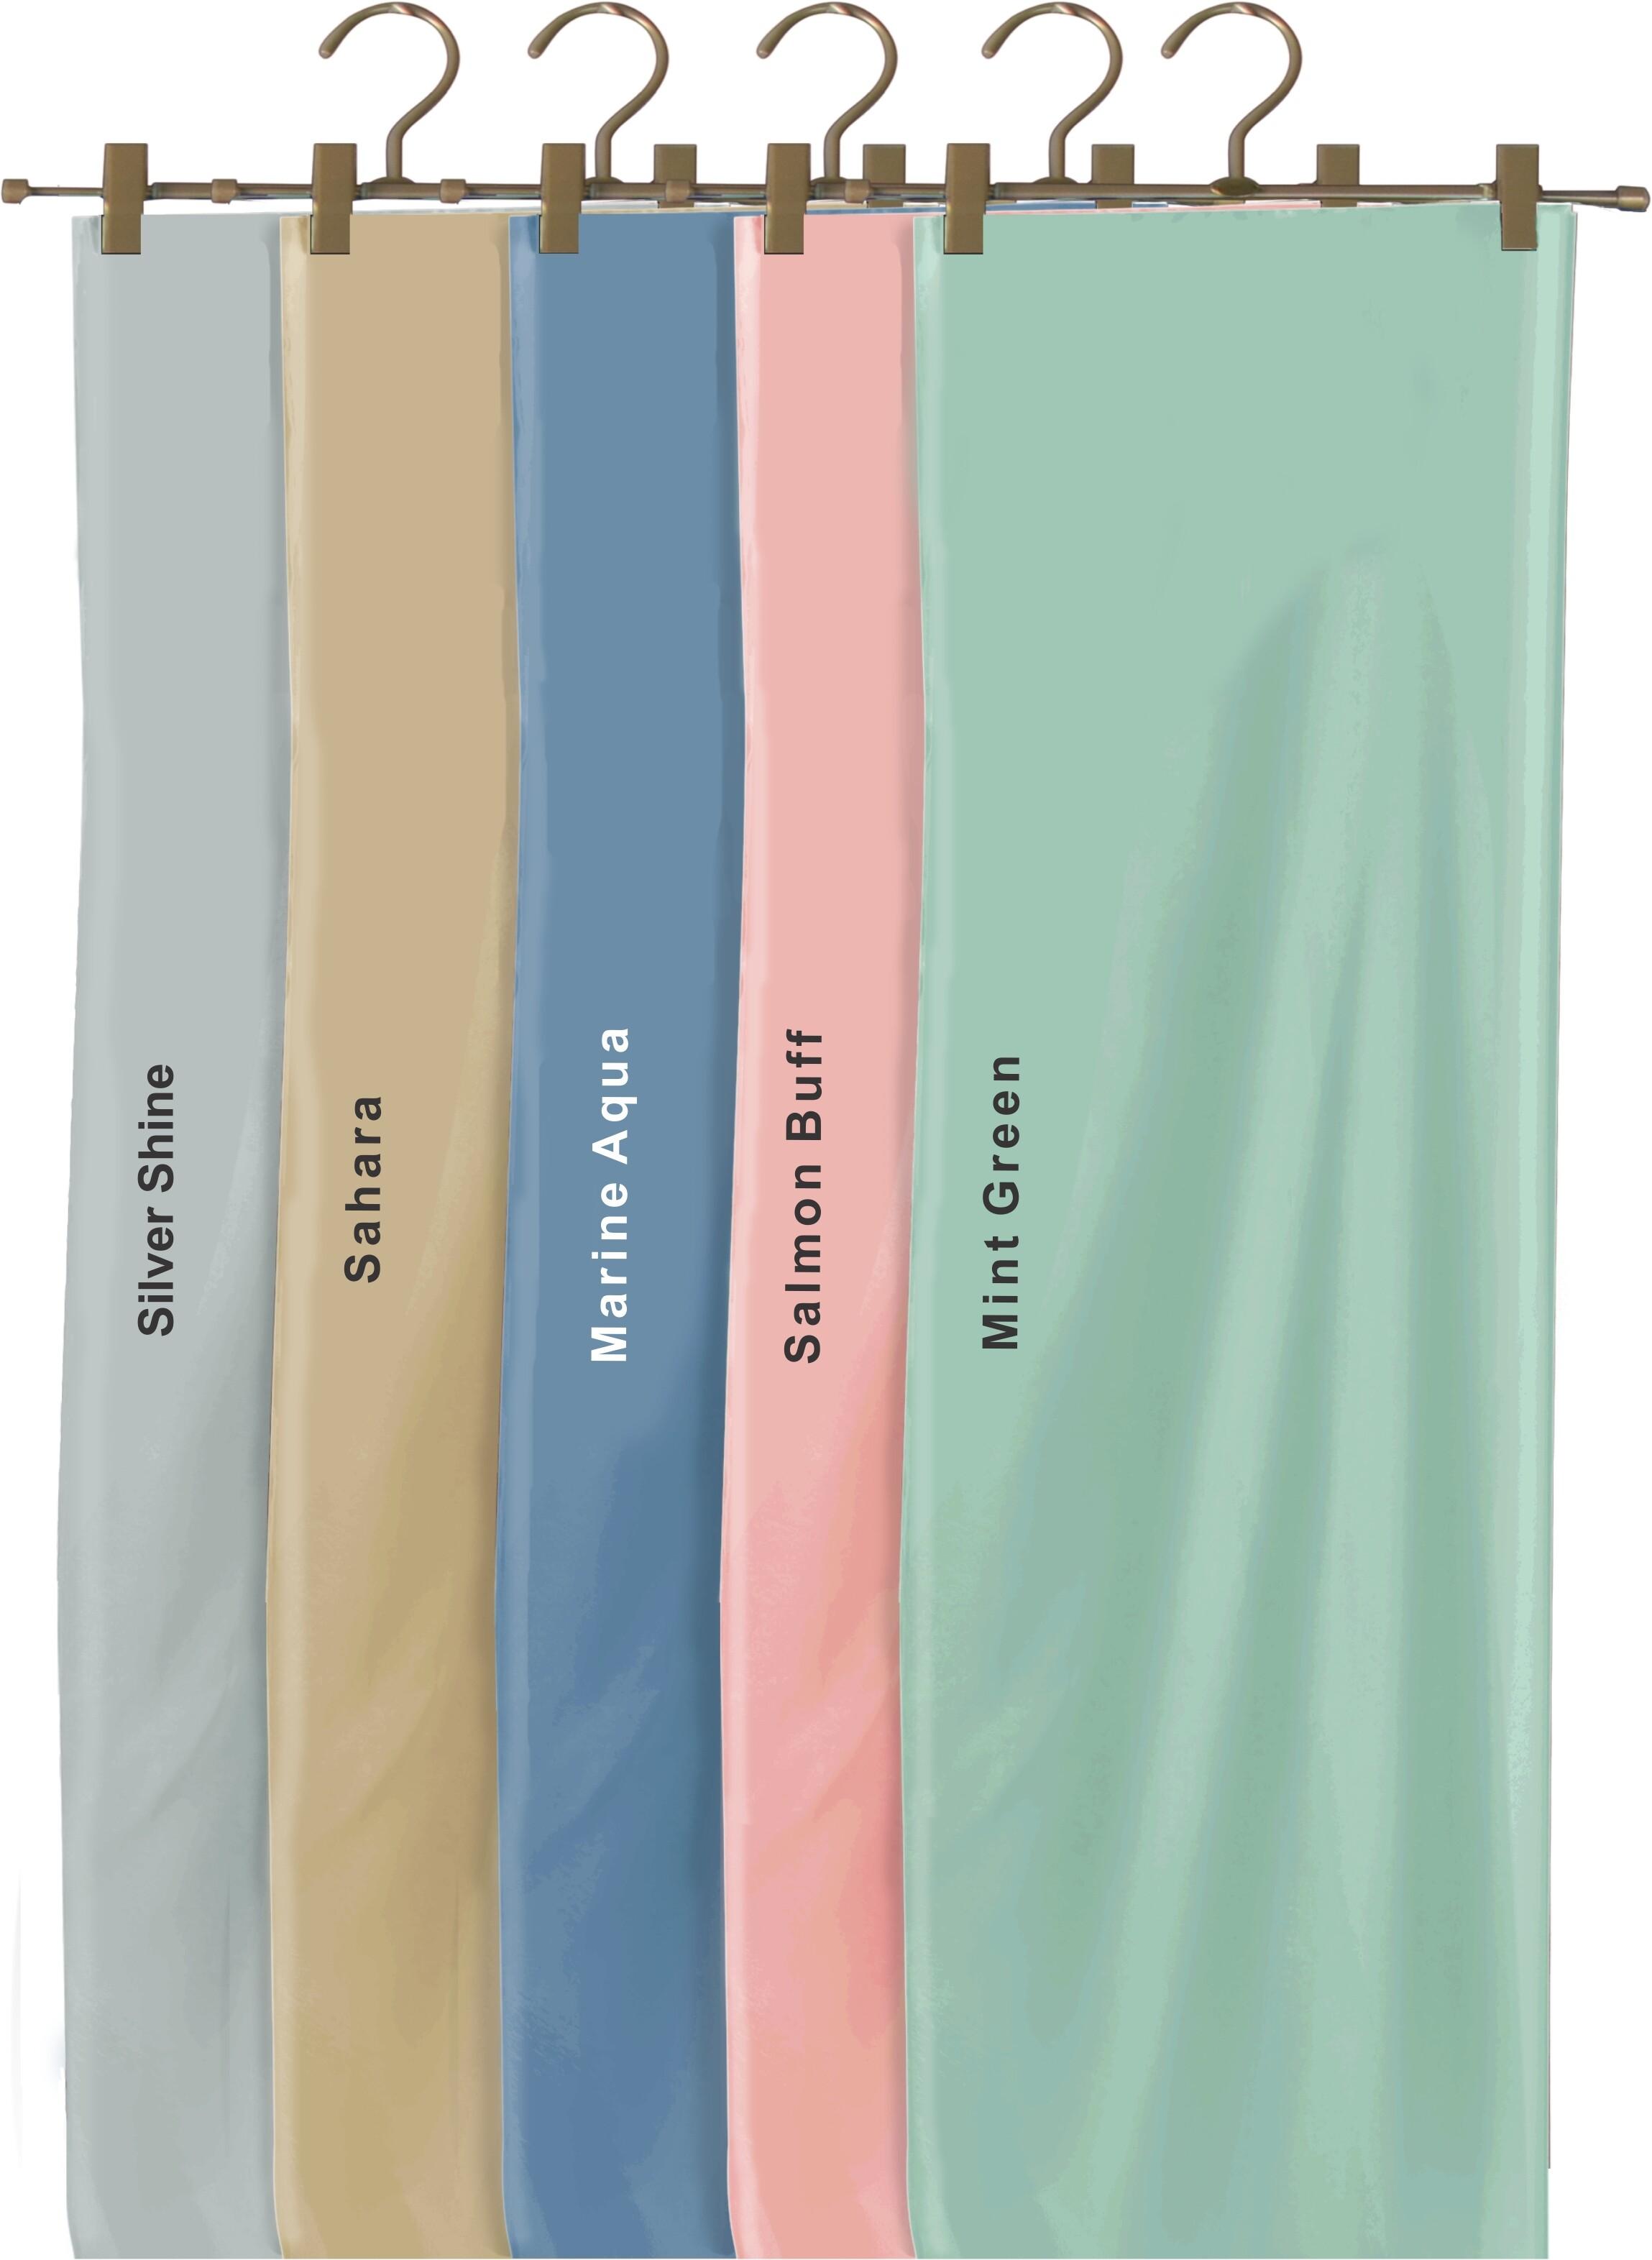 Sawks Hijab Long Shawl - Plain Colour